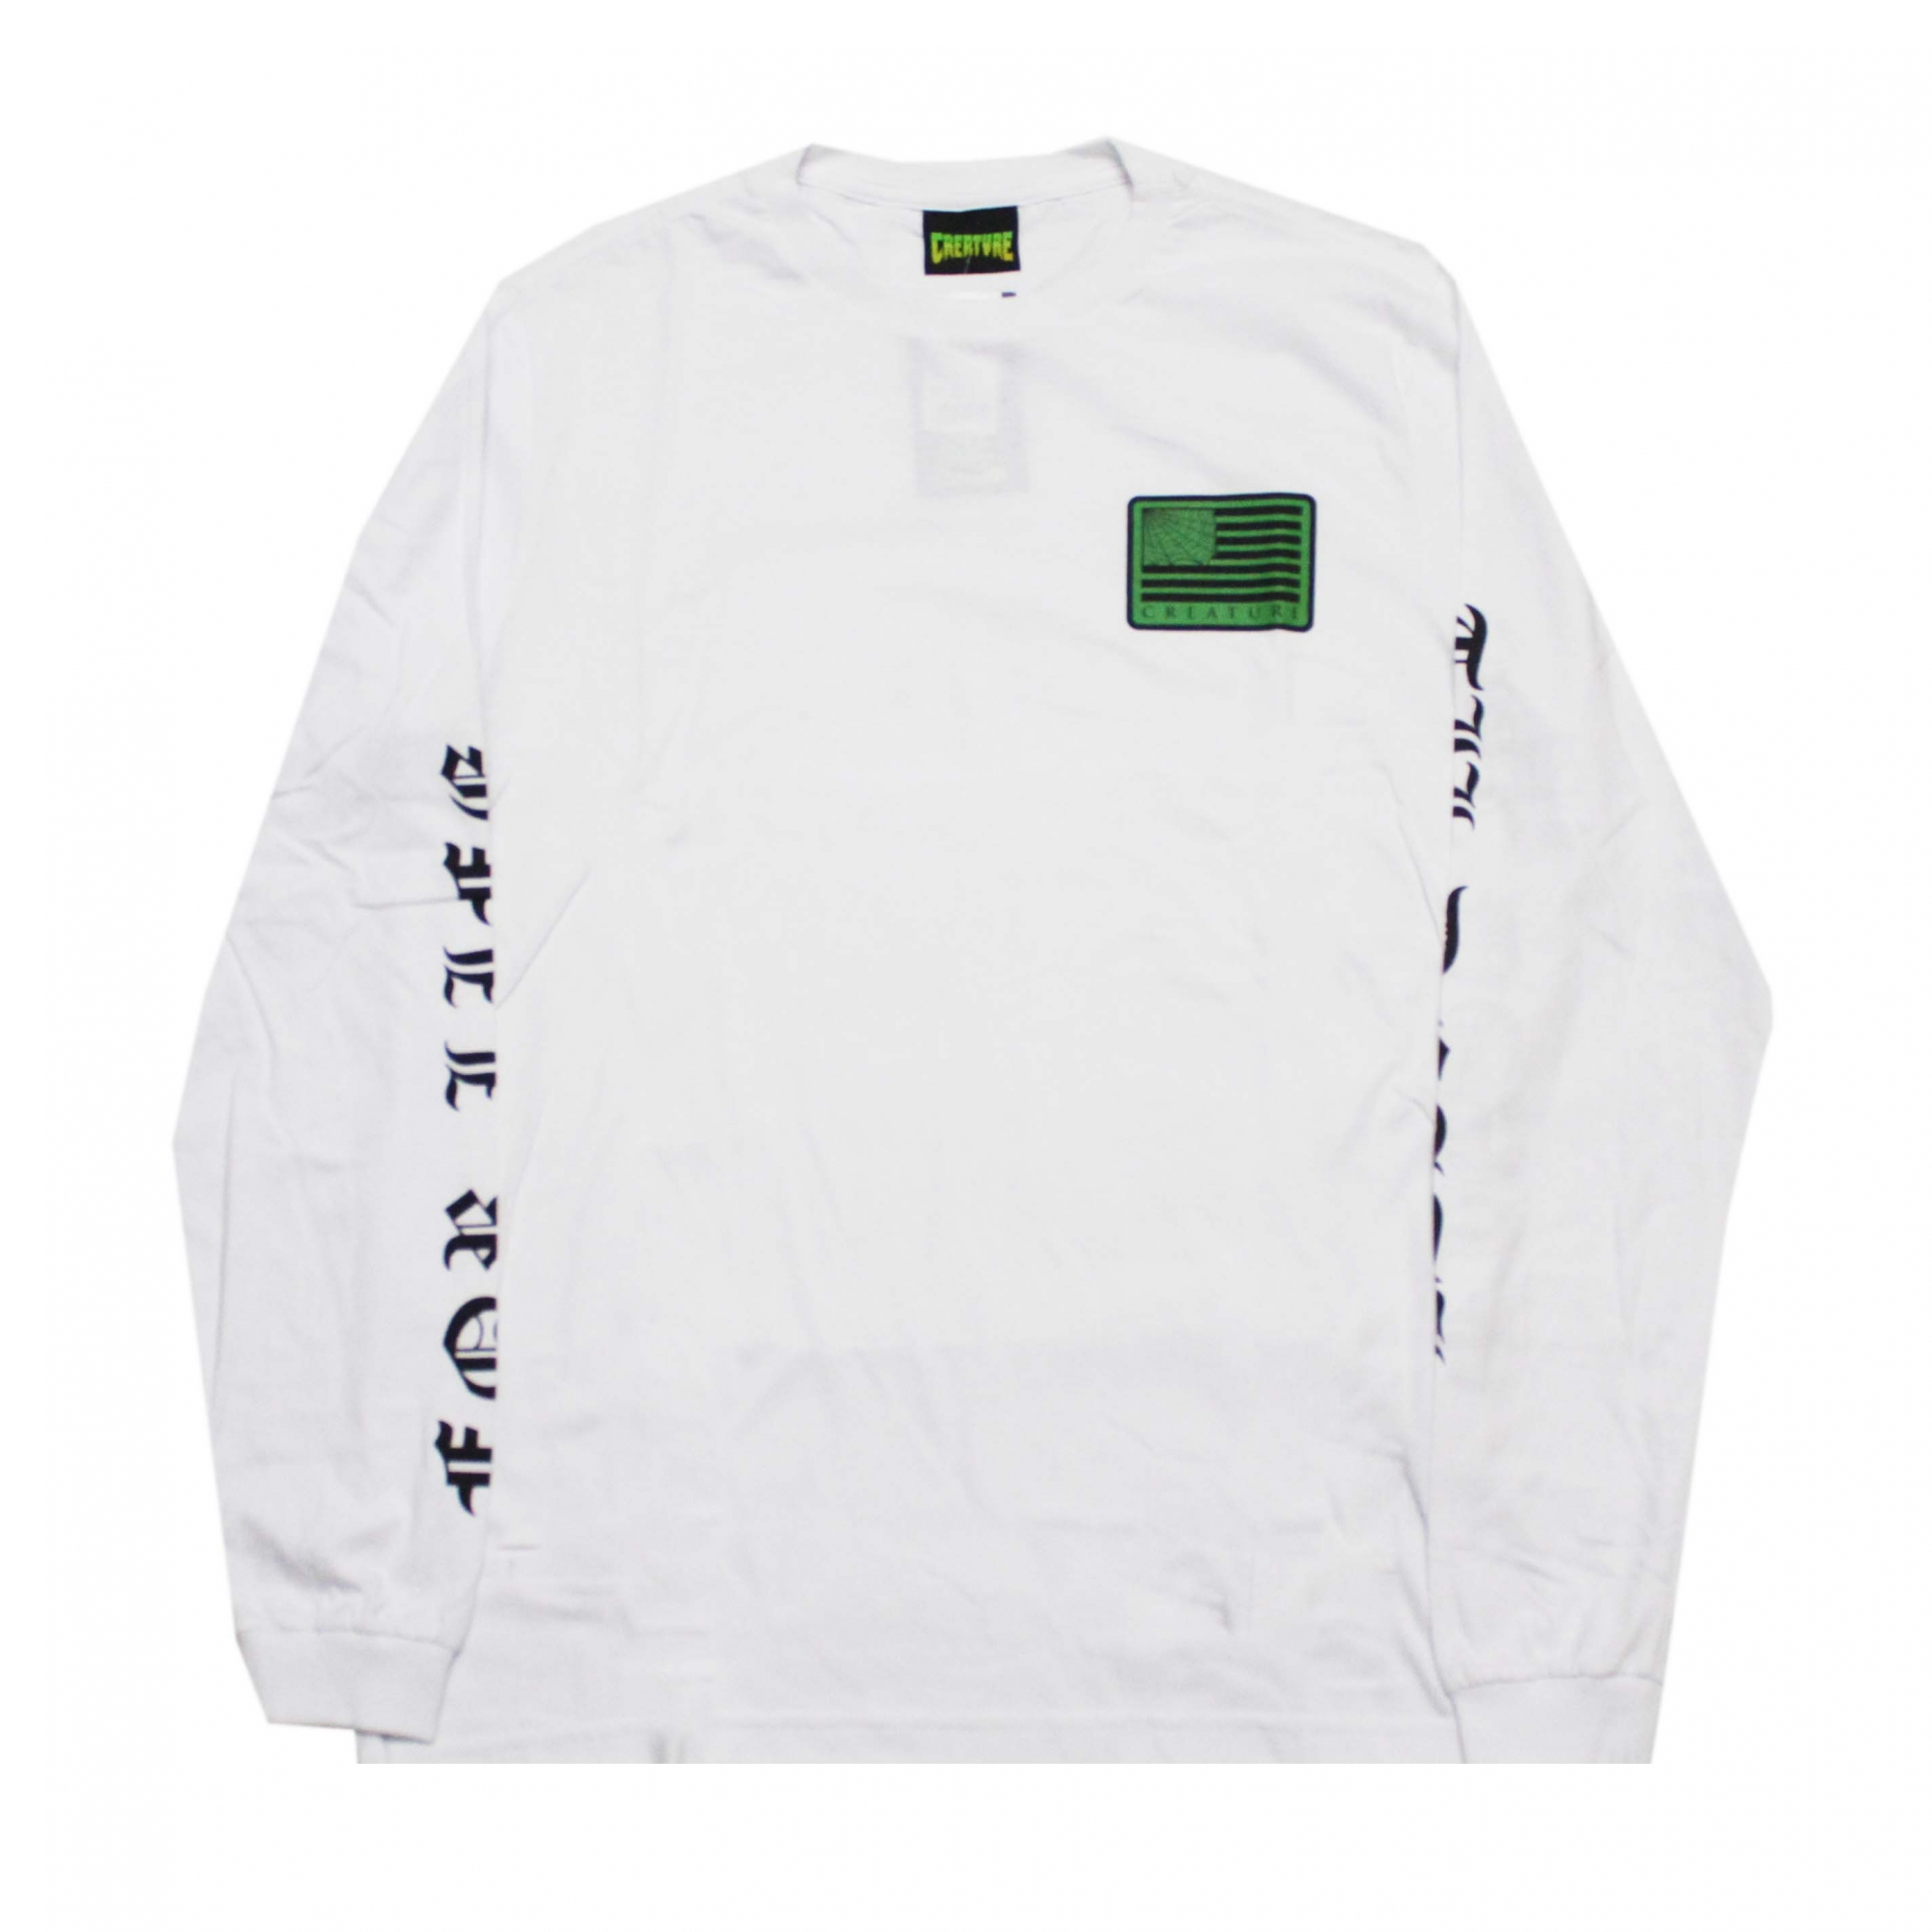 Camiseta Manga Longa Creature United We Lurk - Branco